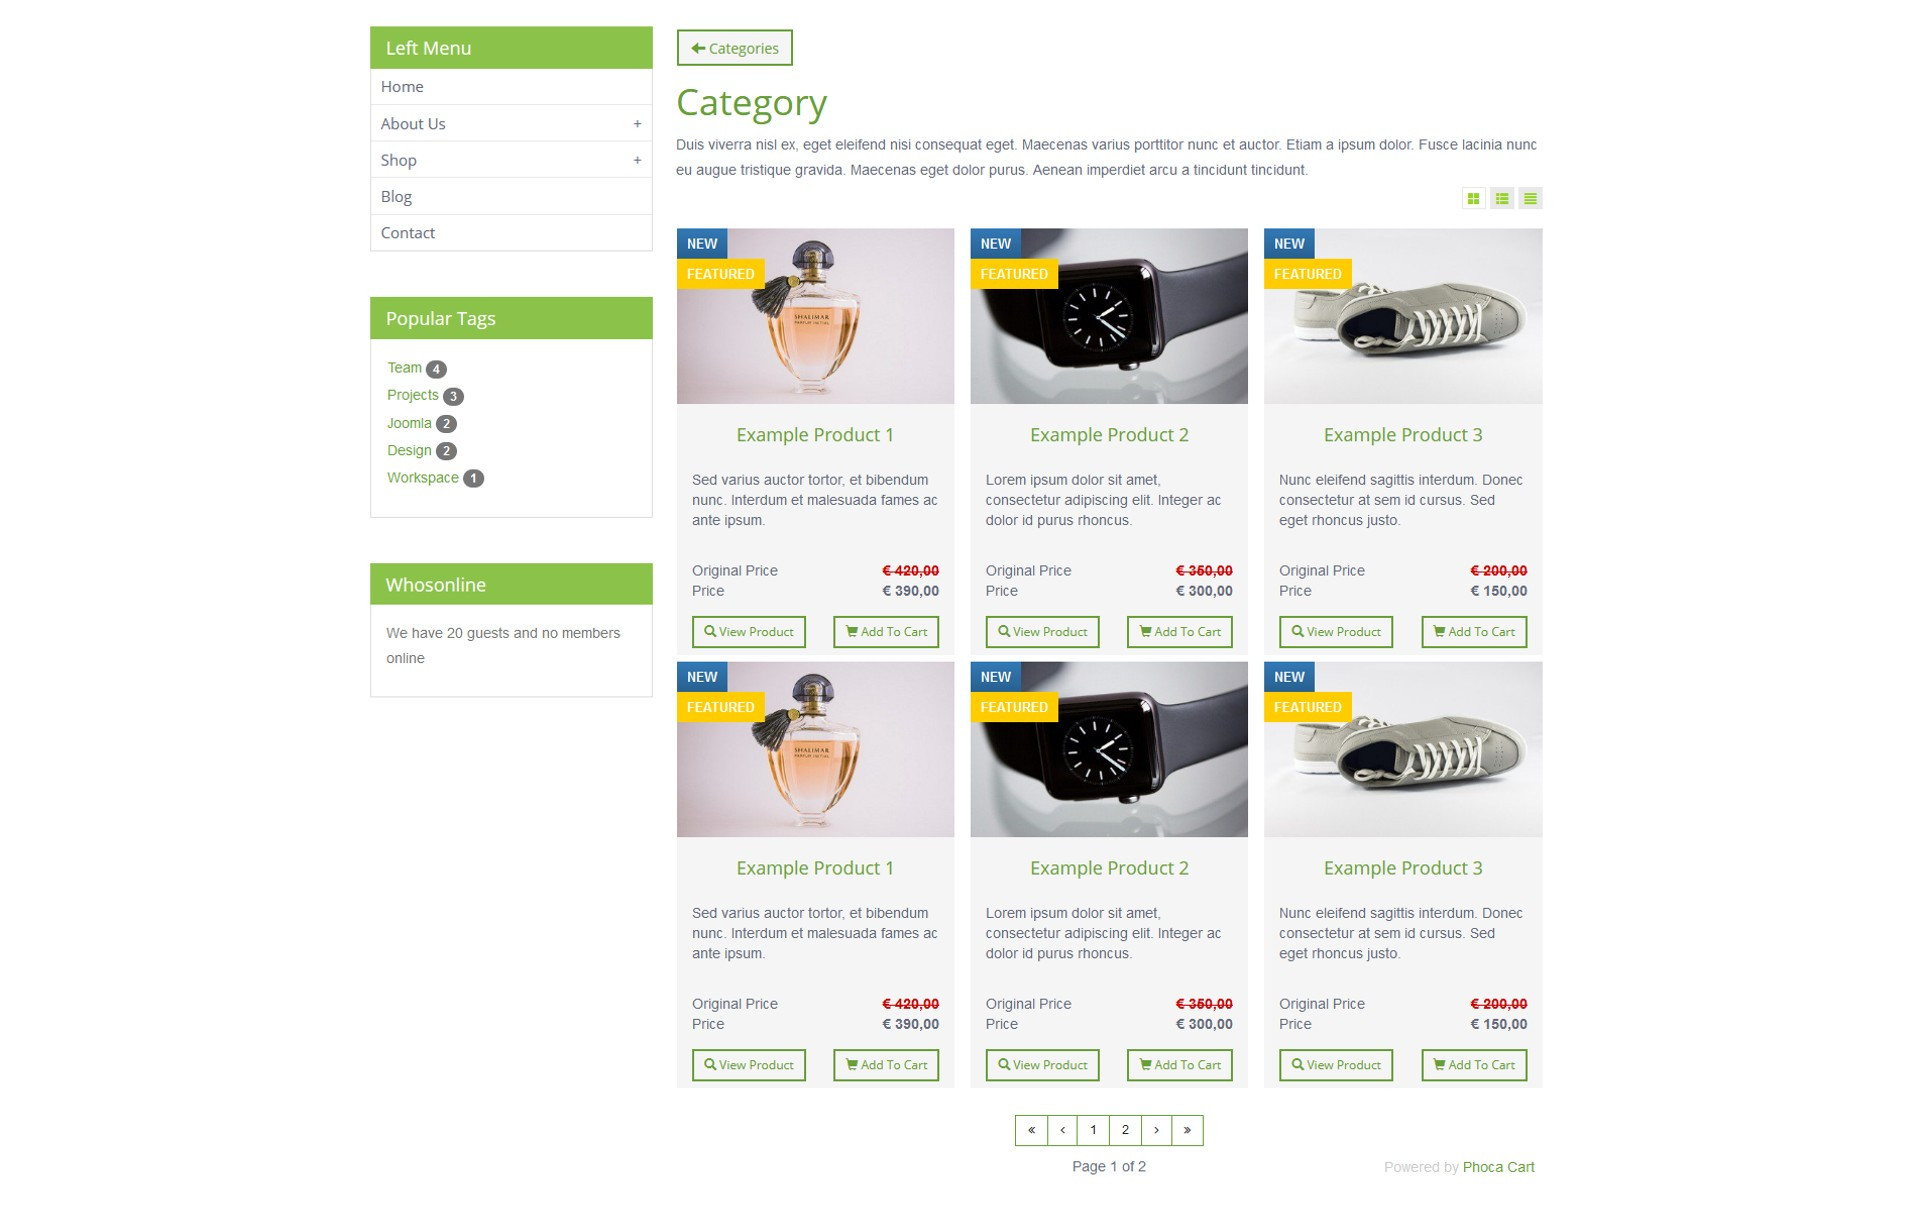 Phoca Cart seznam produktů